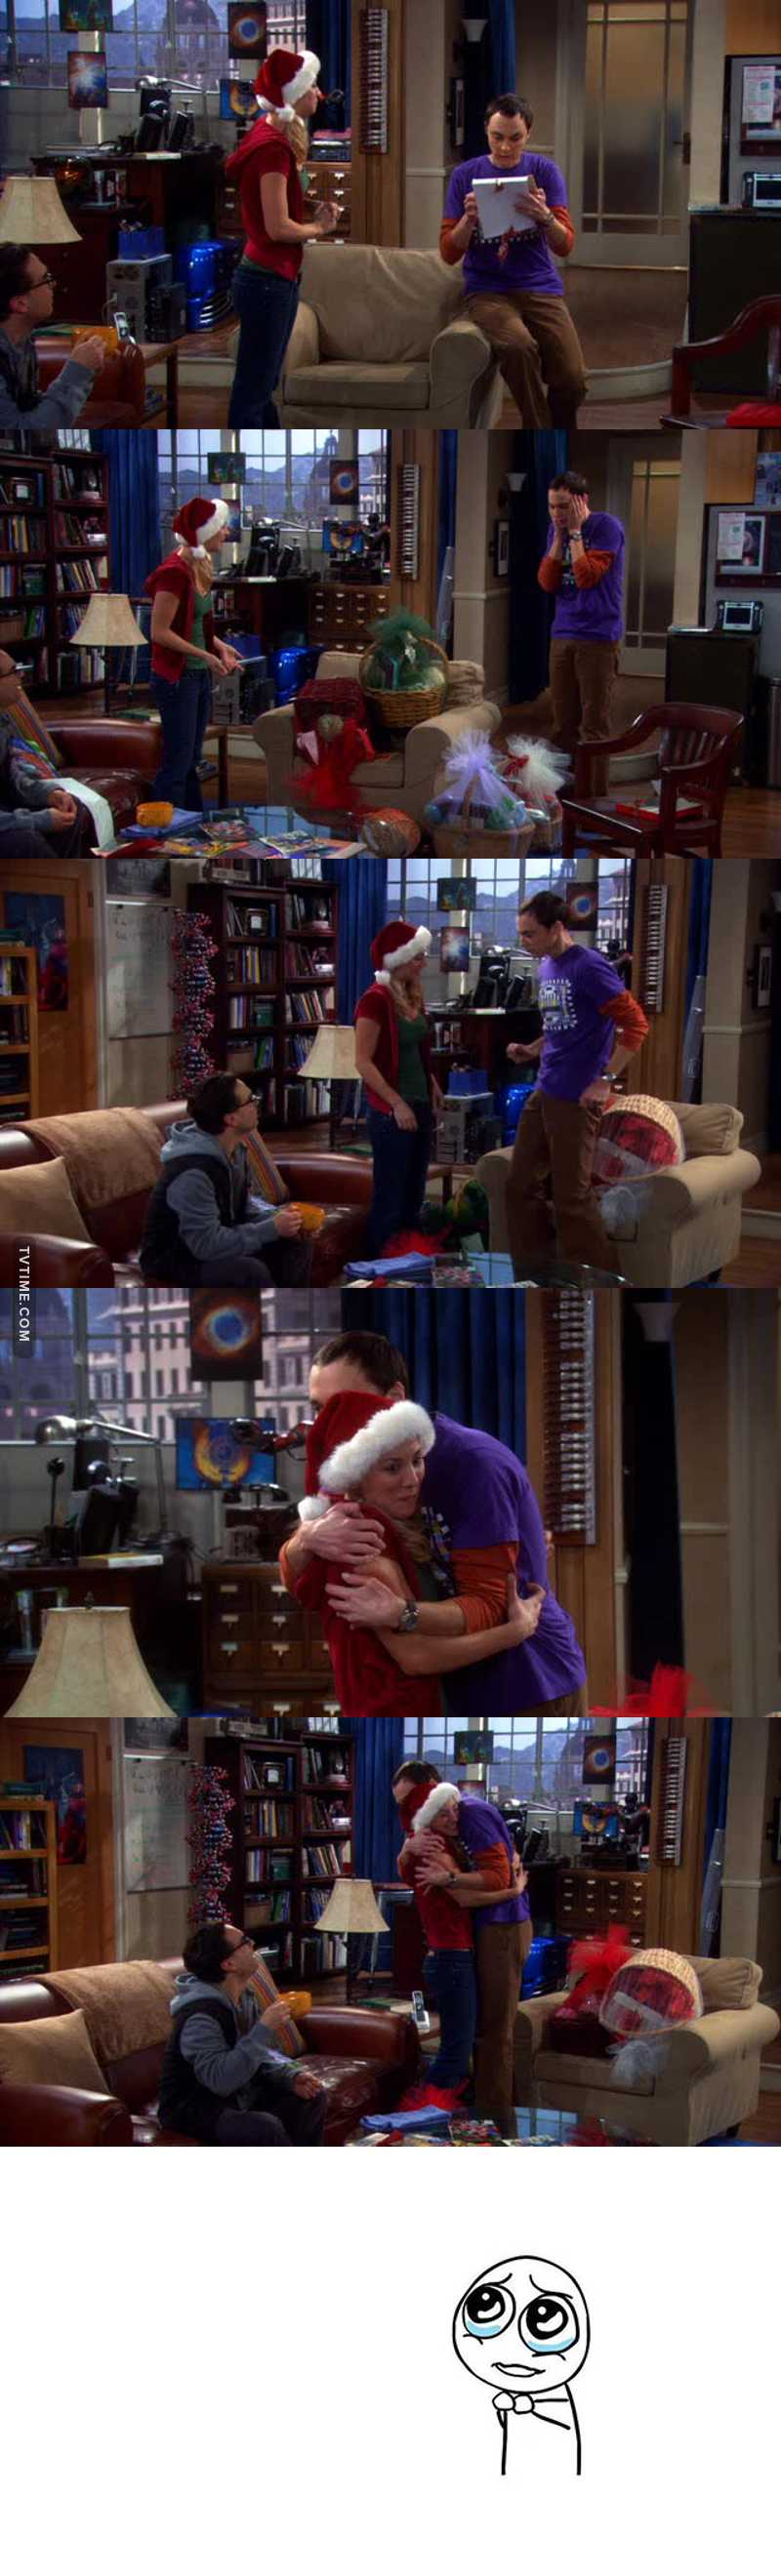 they're like siblings ❤️ i love them Sheldon is so precious